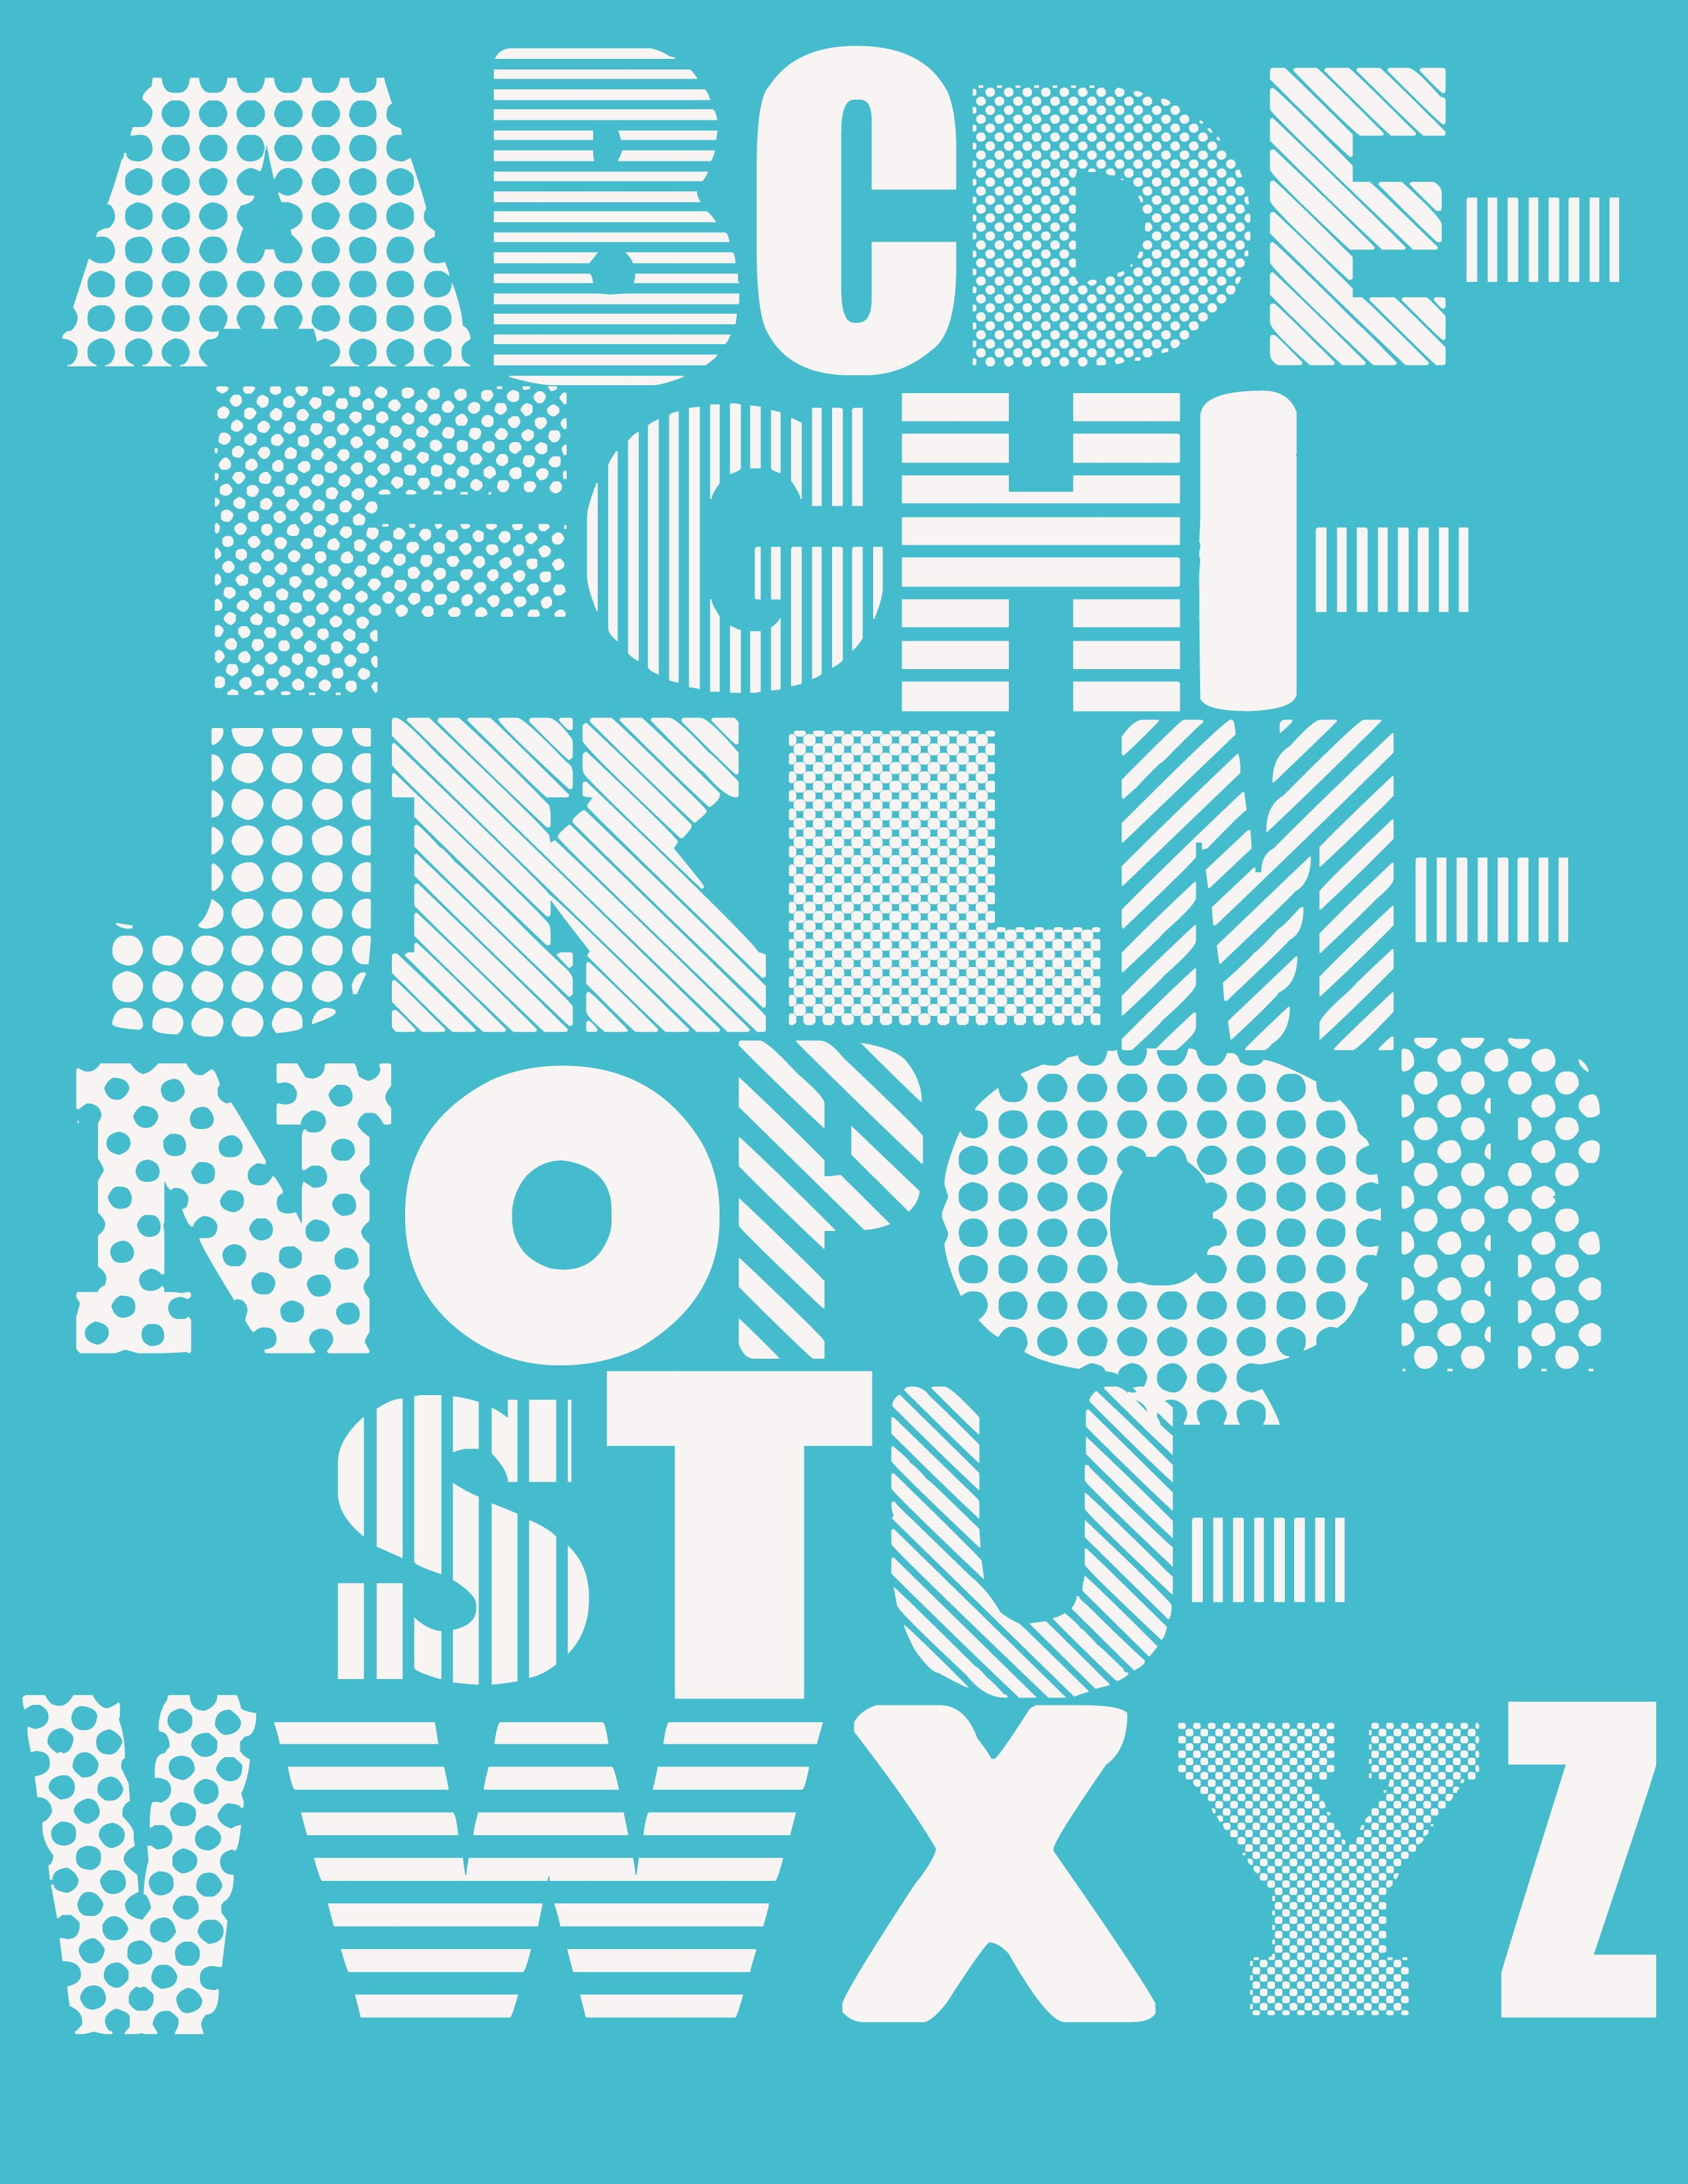 Free Printable Alphabet Poster Plakater Bornevaerelse Og Billeder